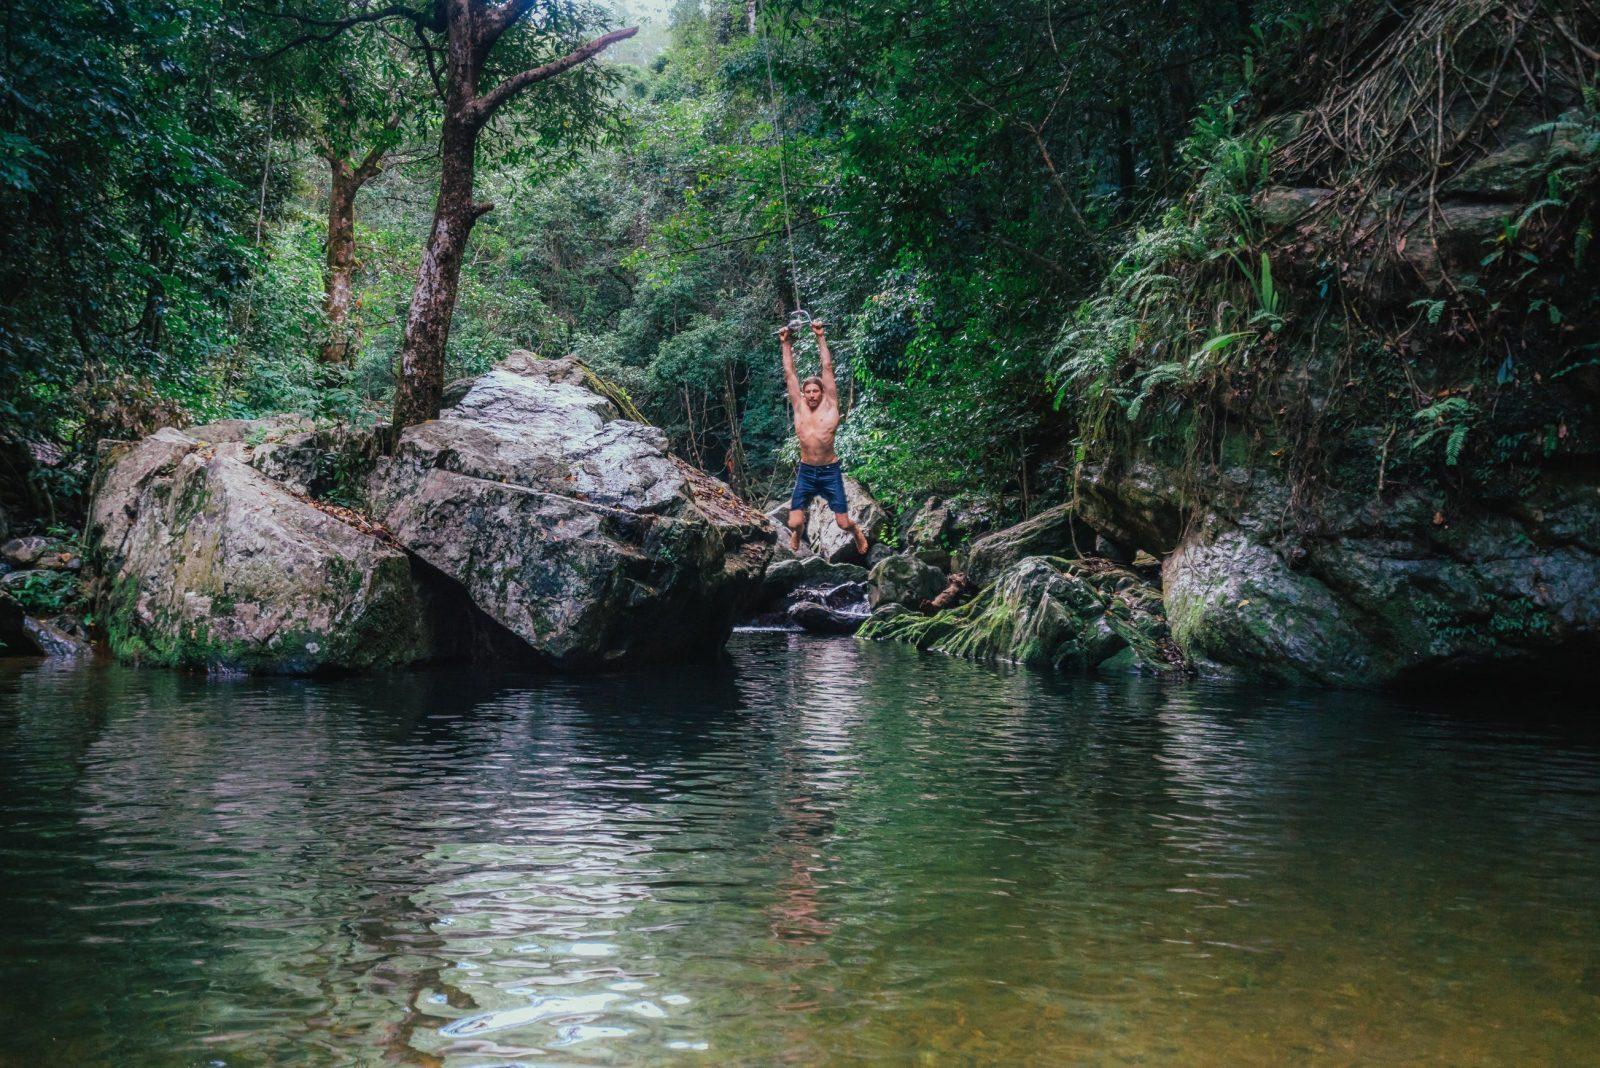 Rope swing at stoney creek